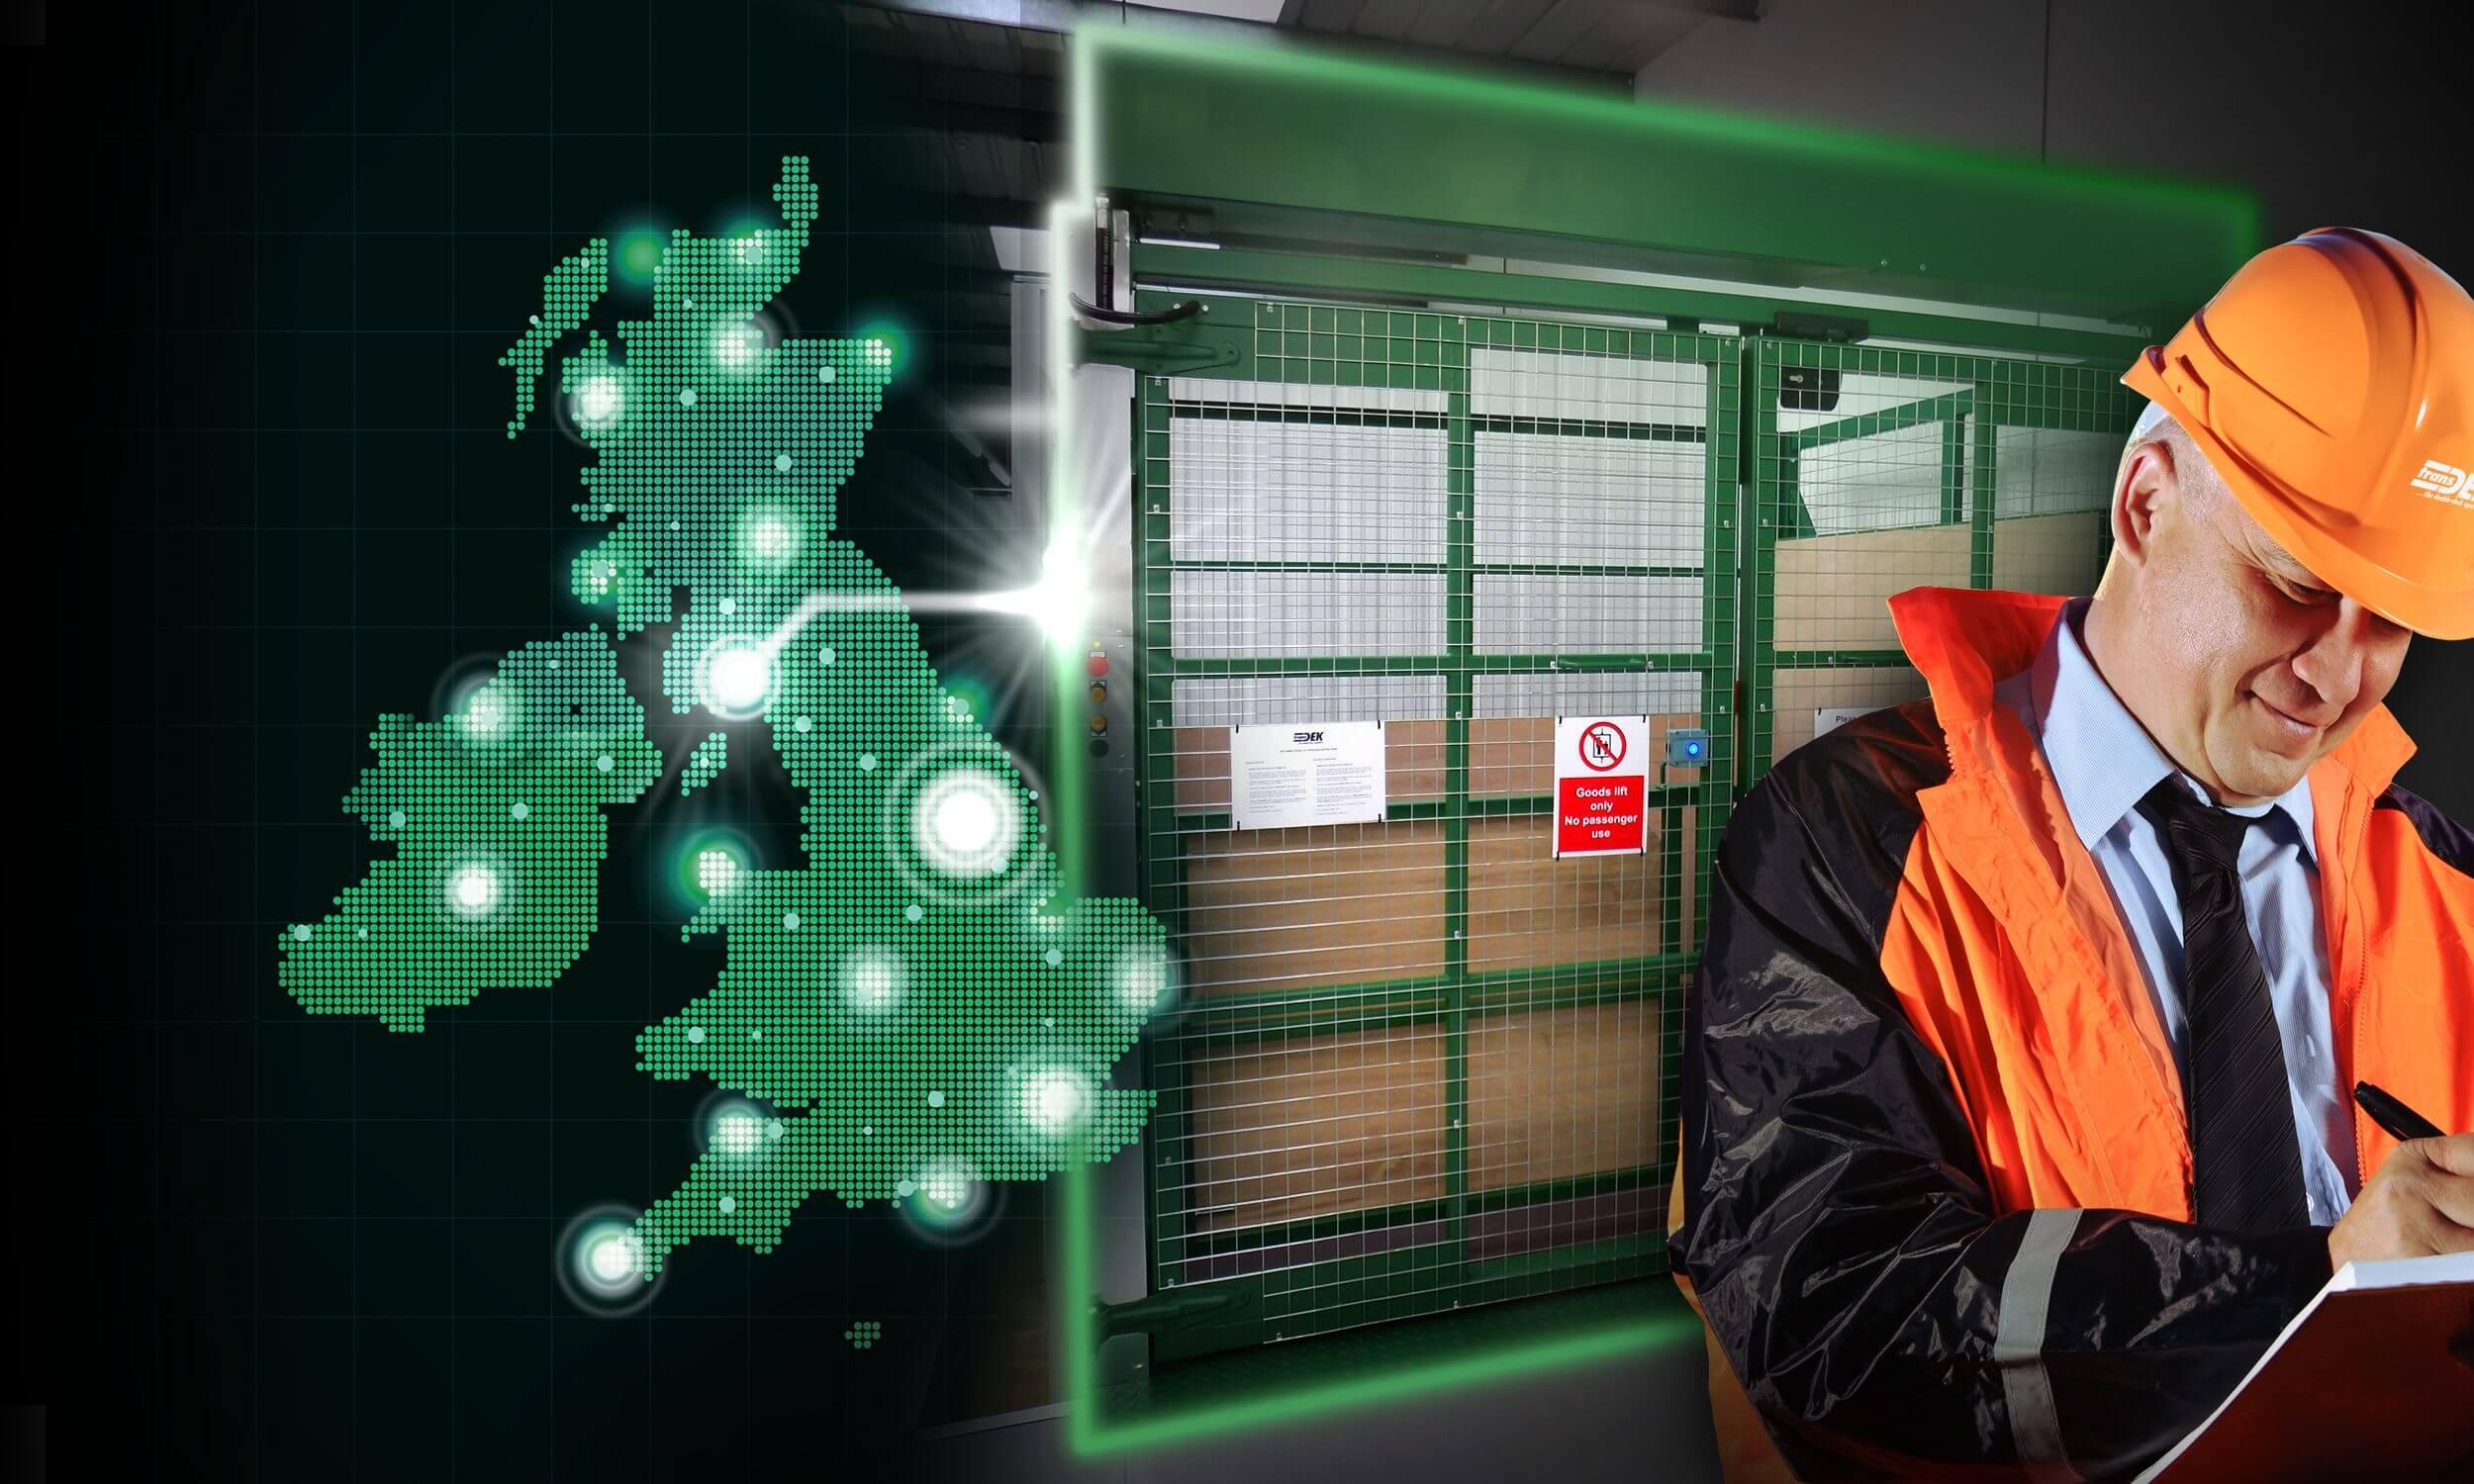 Man servicing goods lift + UK map